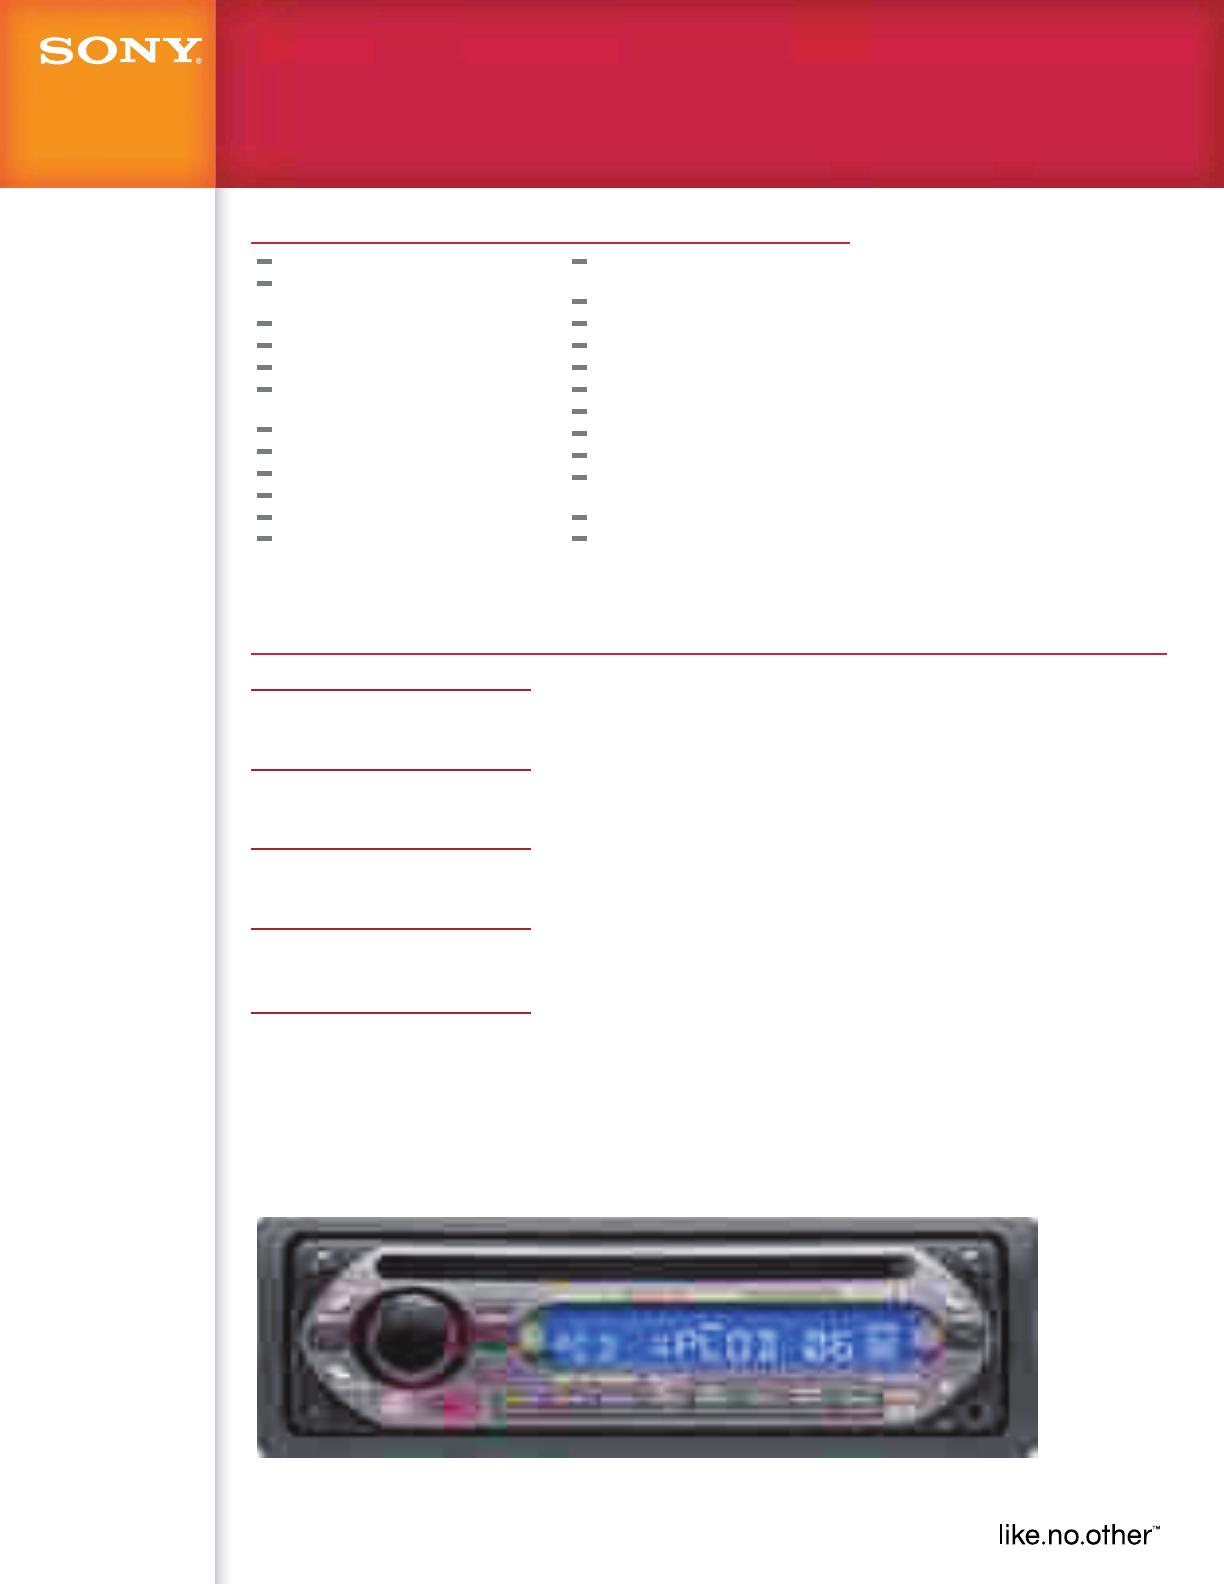 Sony Cdx Gt200 User Manual Marketing Specifications Cdxgt200 Mksp